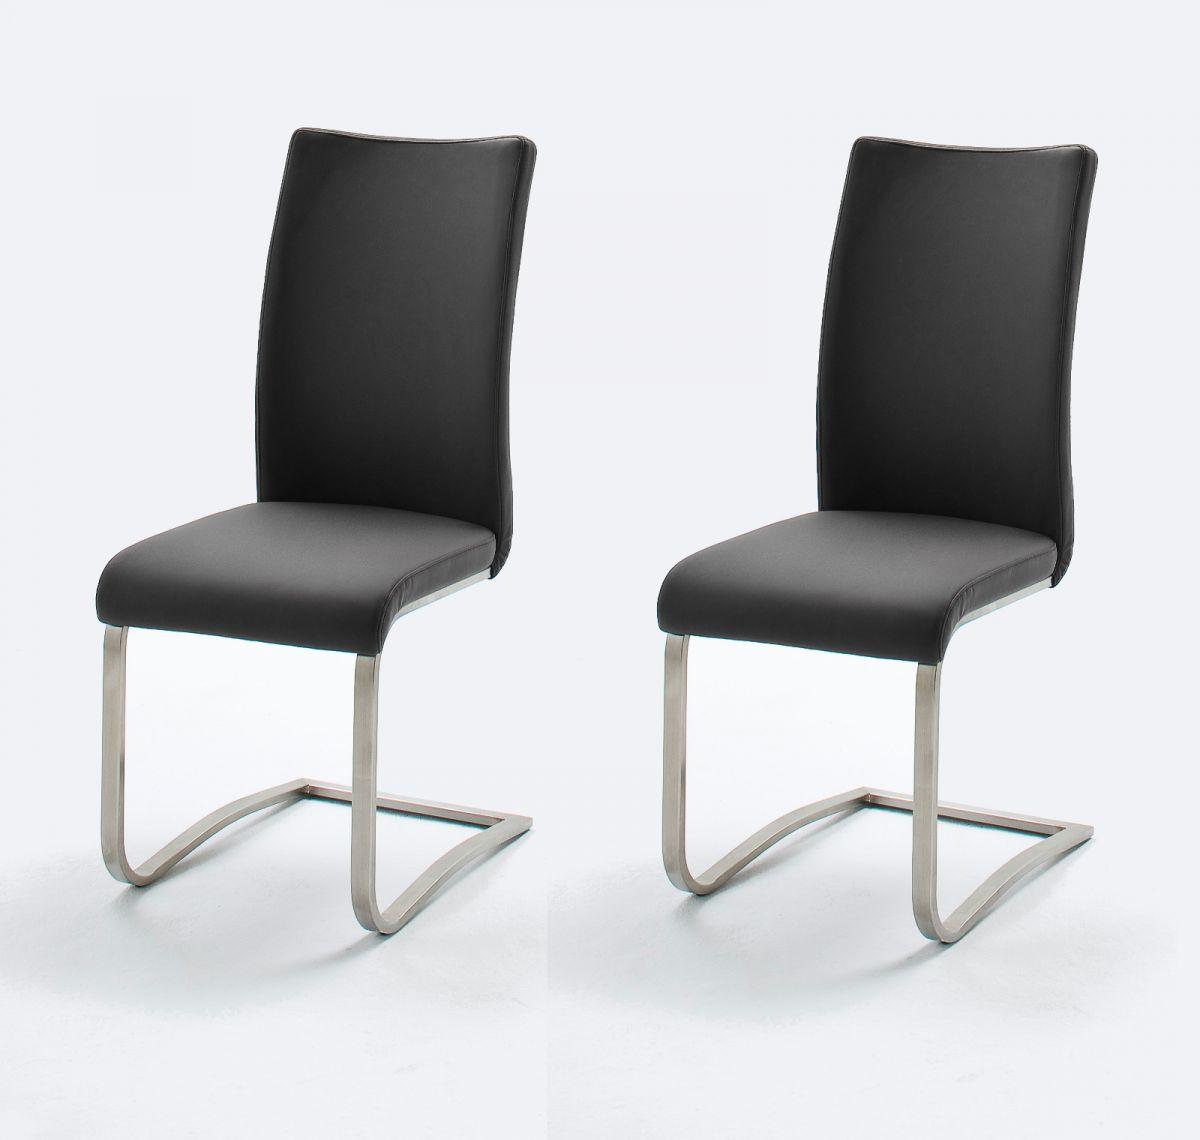 2 x Stuhl Arco Schwarz Schwinger Kunstleder